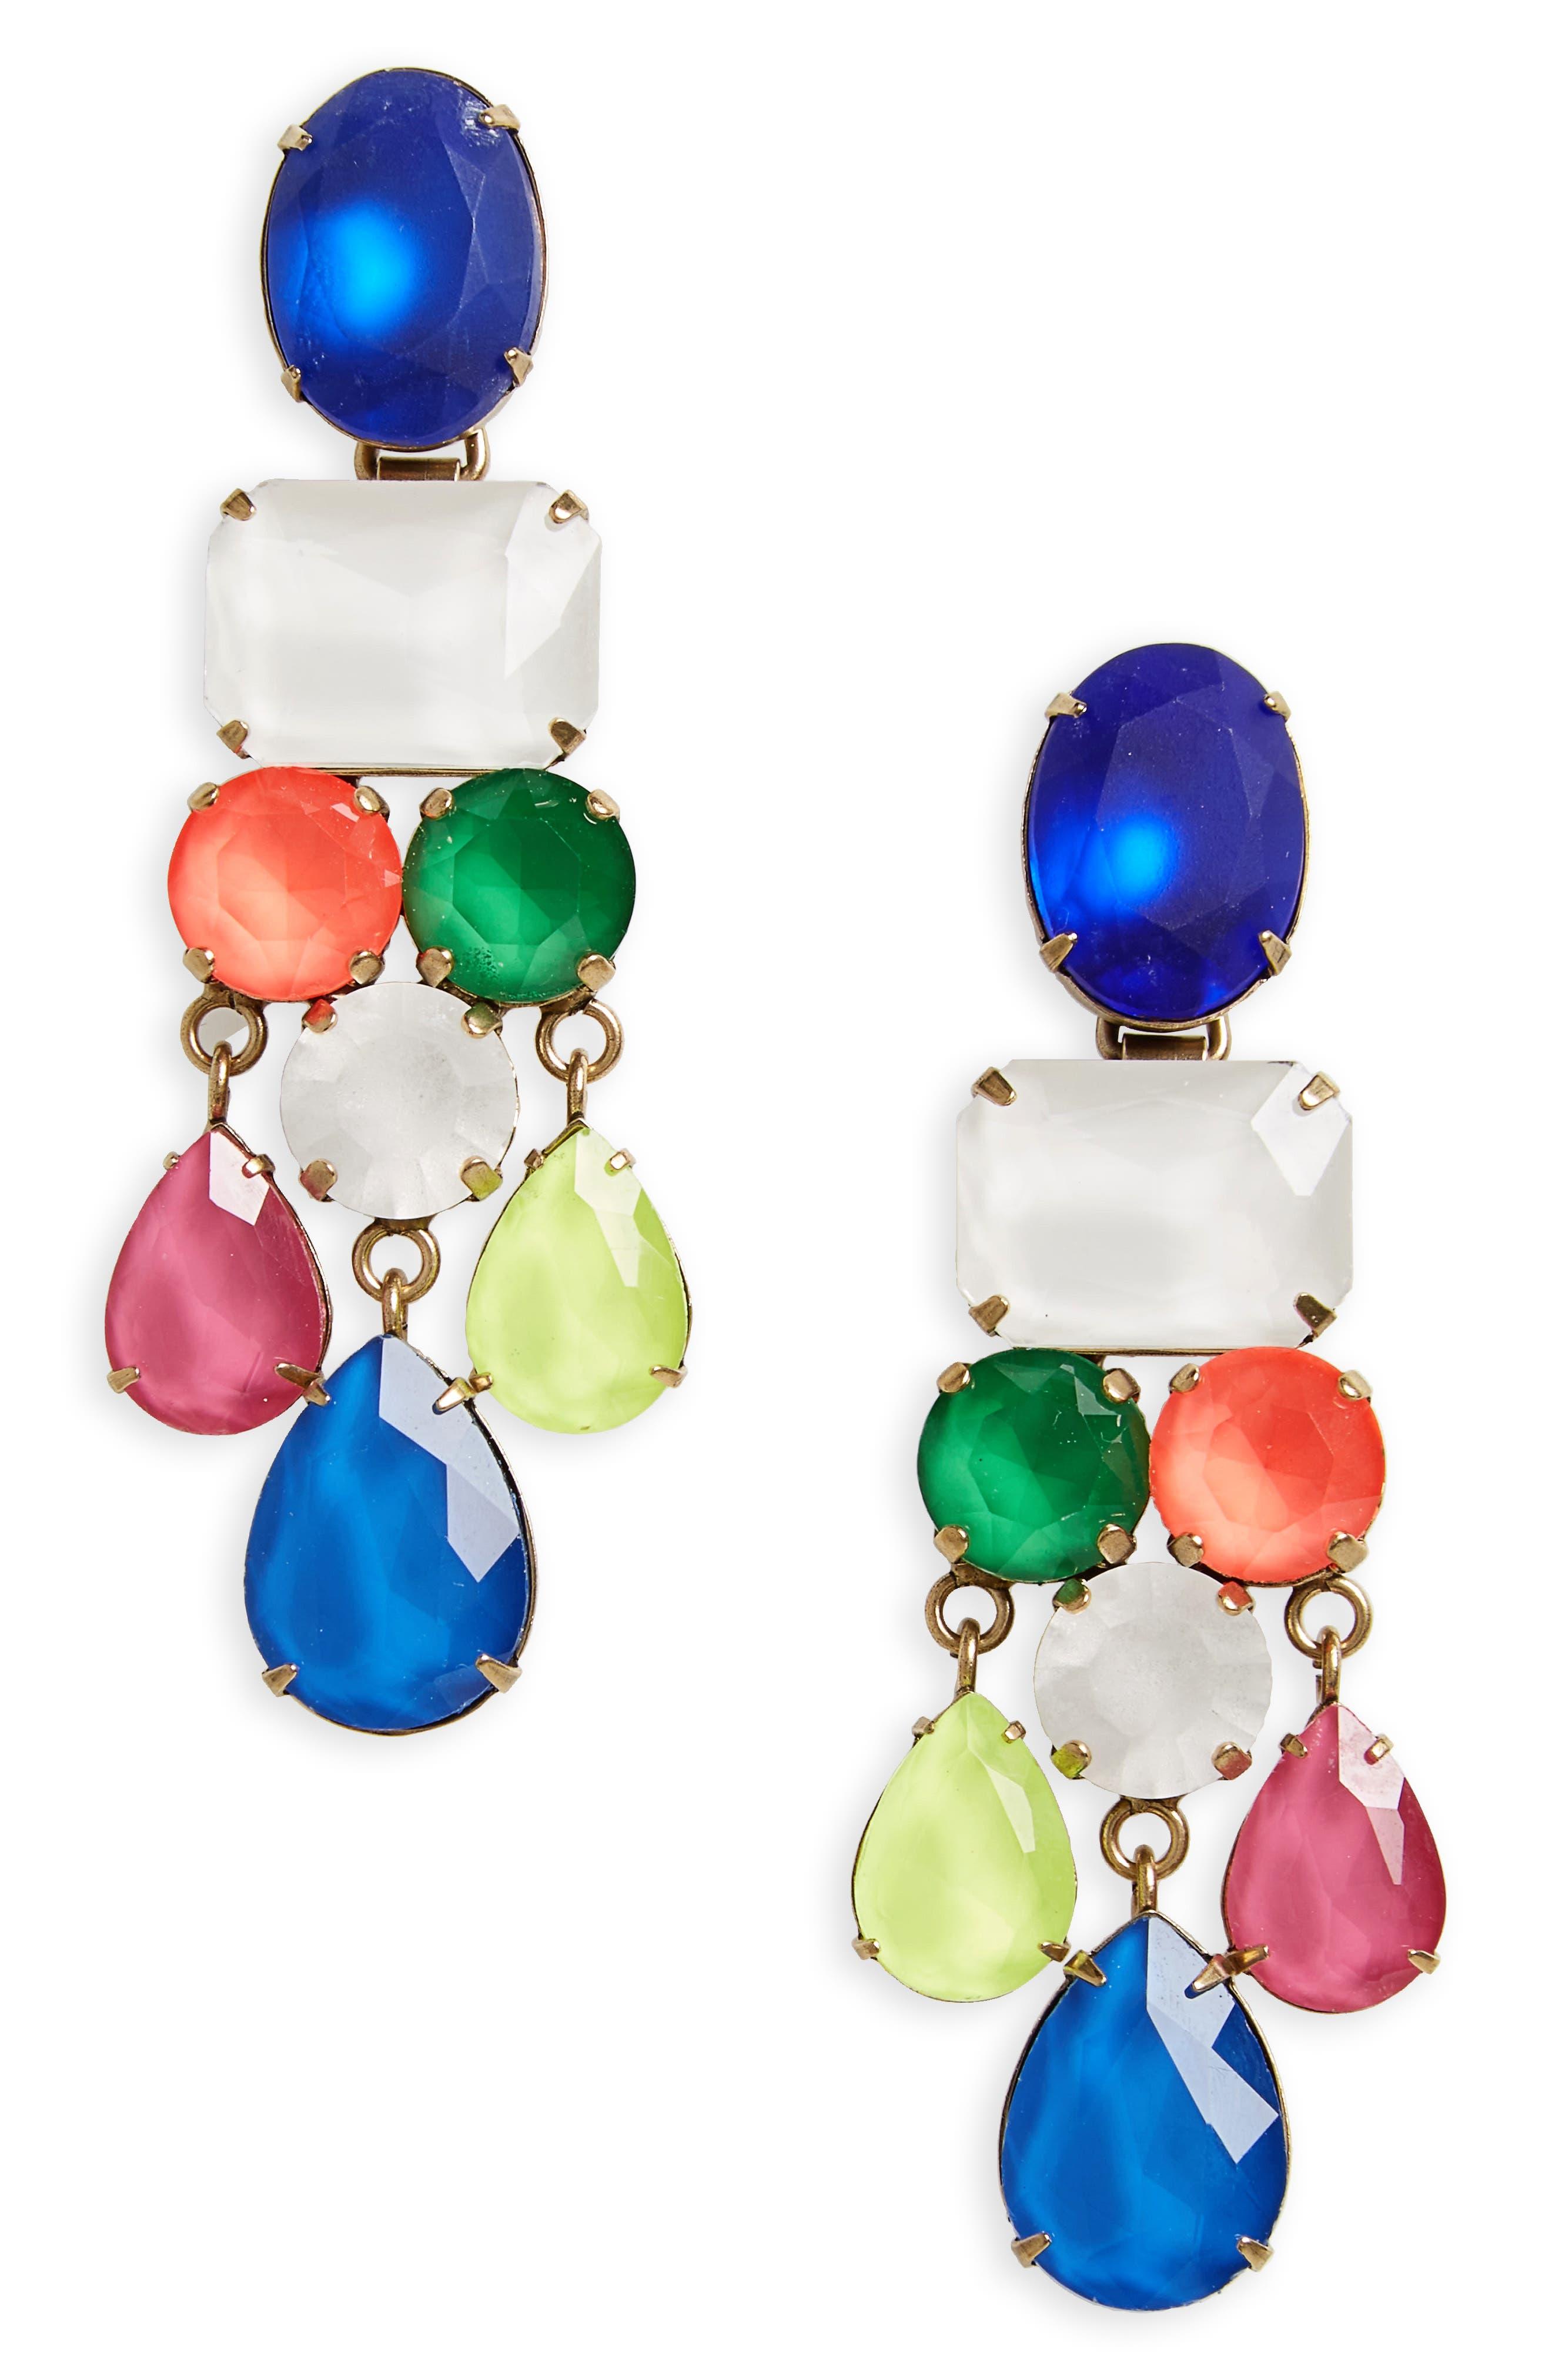 Main Image - Loren Hope Scarlet Jewel Statement Earrings